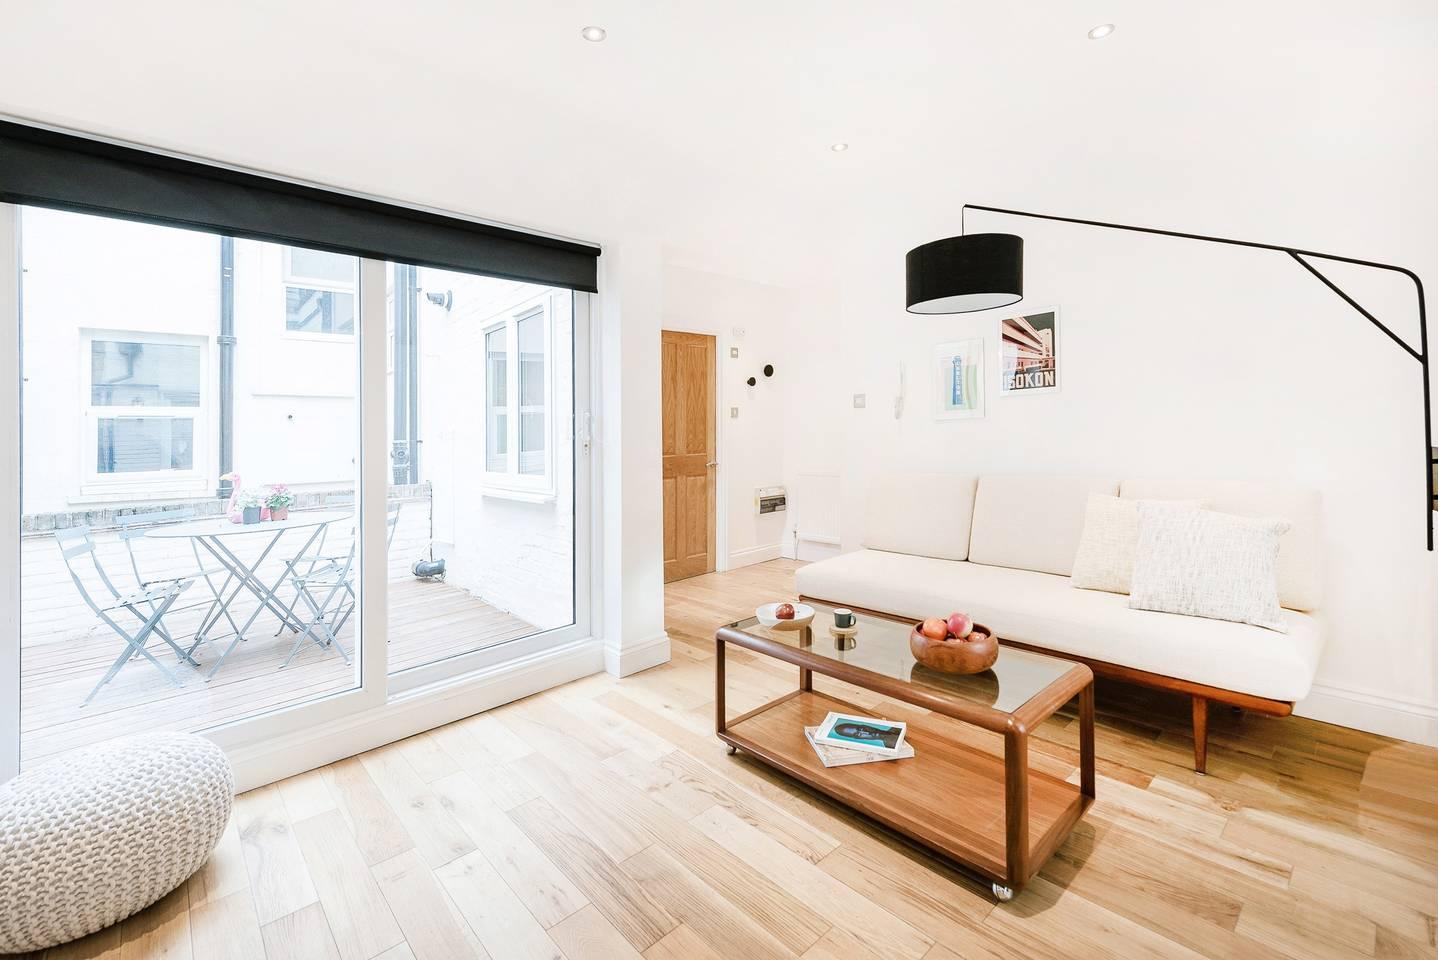 Soho Oxford Street Apartments, London, SilverDoor Apartments